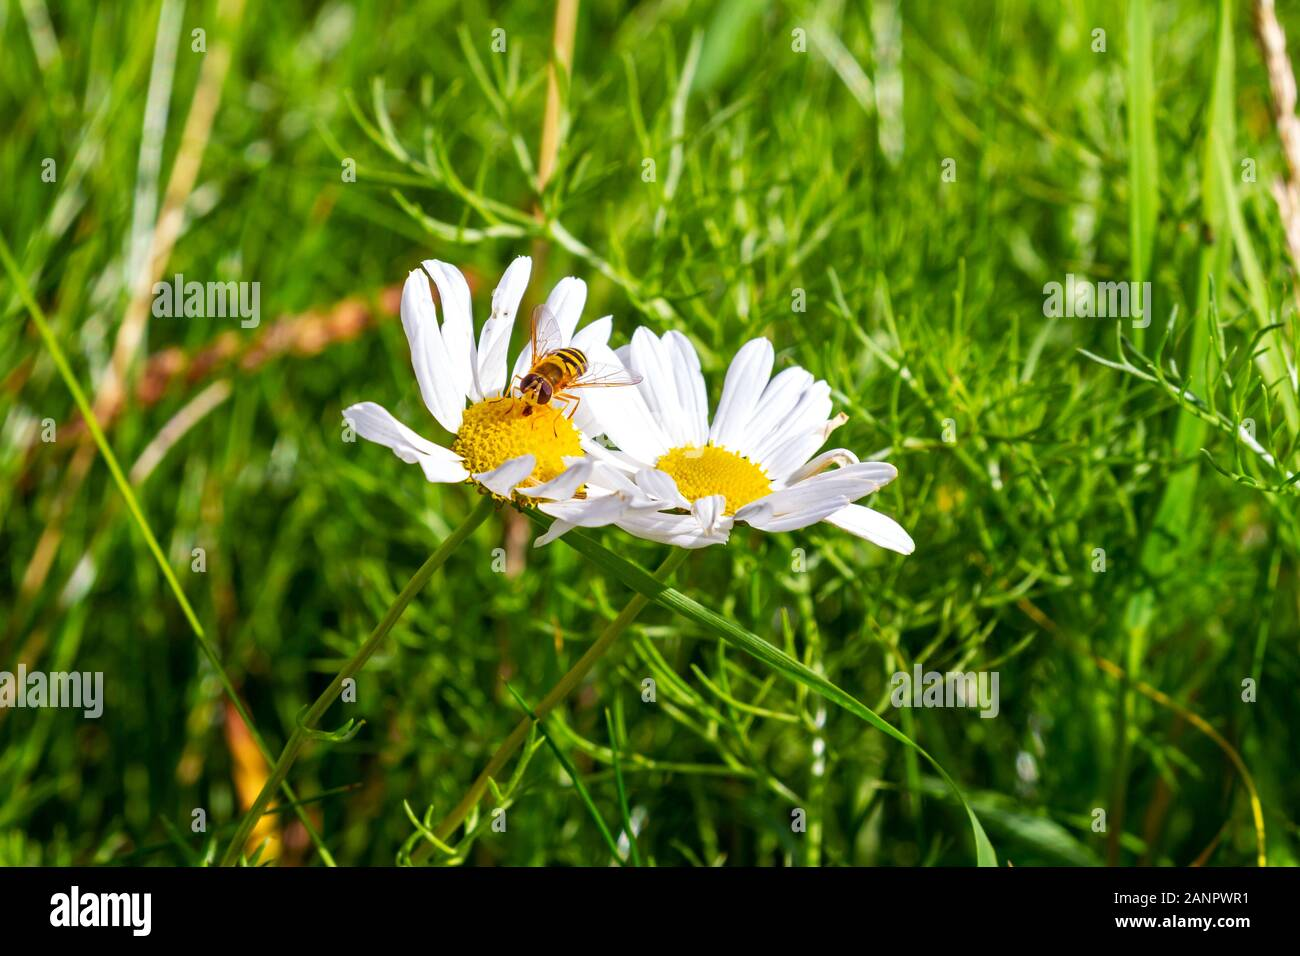 Bee collects pollen from  echinacea coneflower flower. Echinacea purpurea, PowWow White, Yellow cone head and white petals. Garden in Ireland Stock Photo